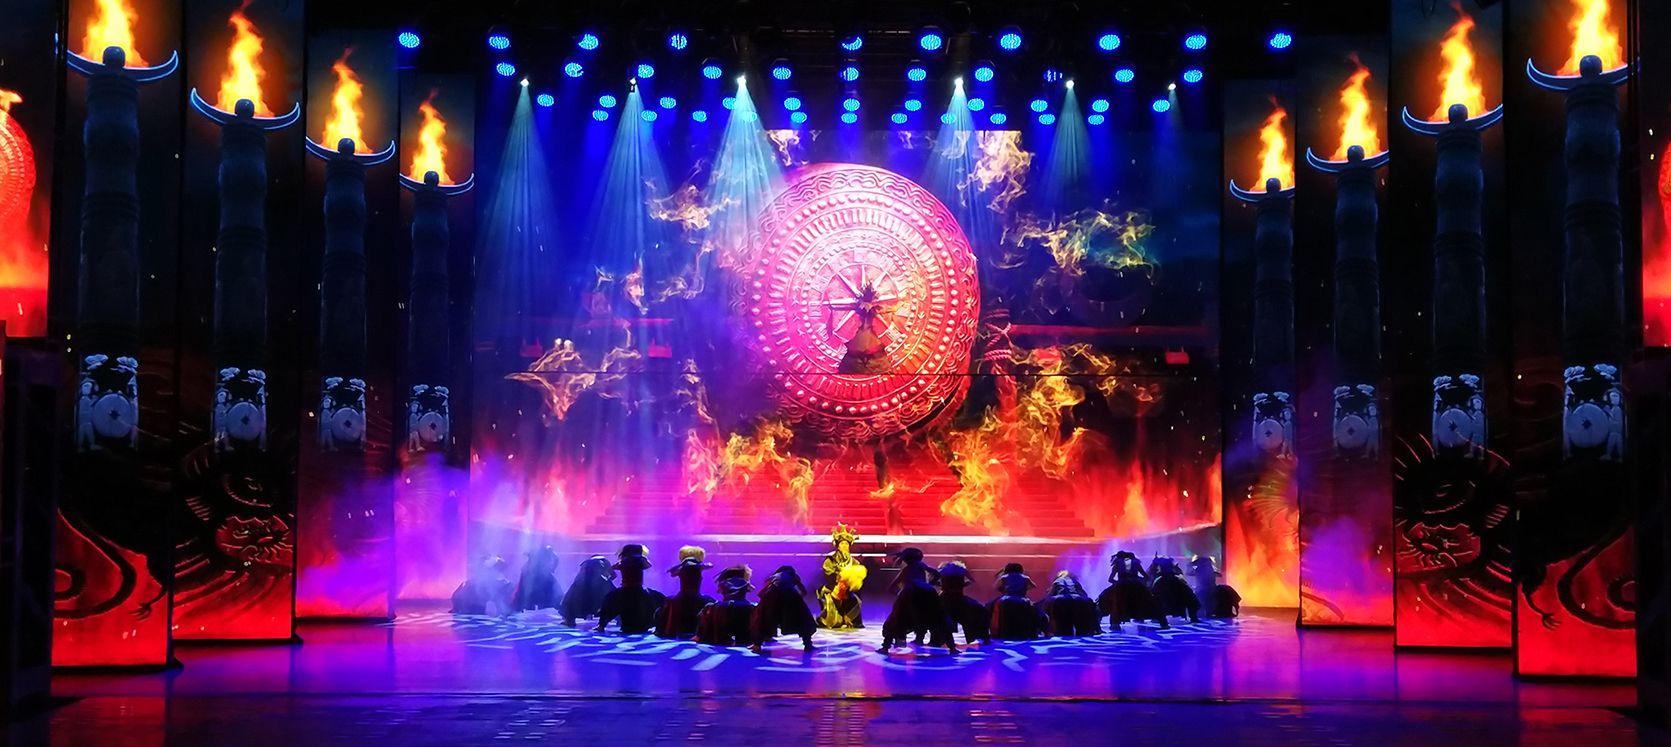 LED teatri va studiya yoritgichi